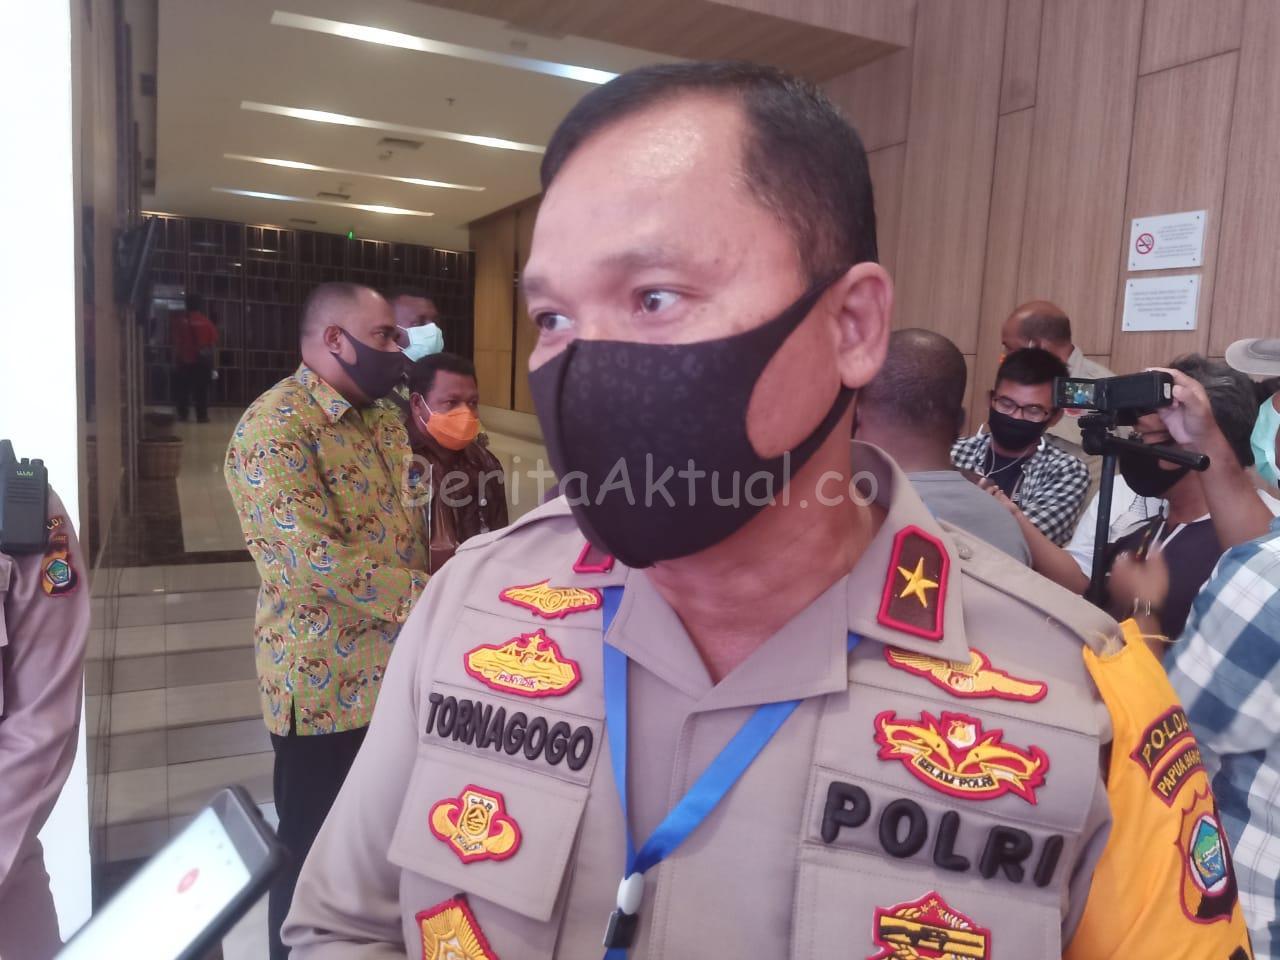 Polda PB Bentuk Tim Khusus Kejar Pelaku Begal Dan Curas di Manokwari Dan Sorong 2 IMG 20200424 WA0044